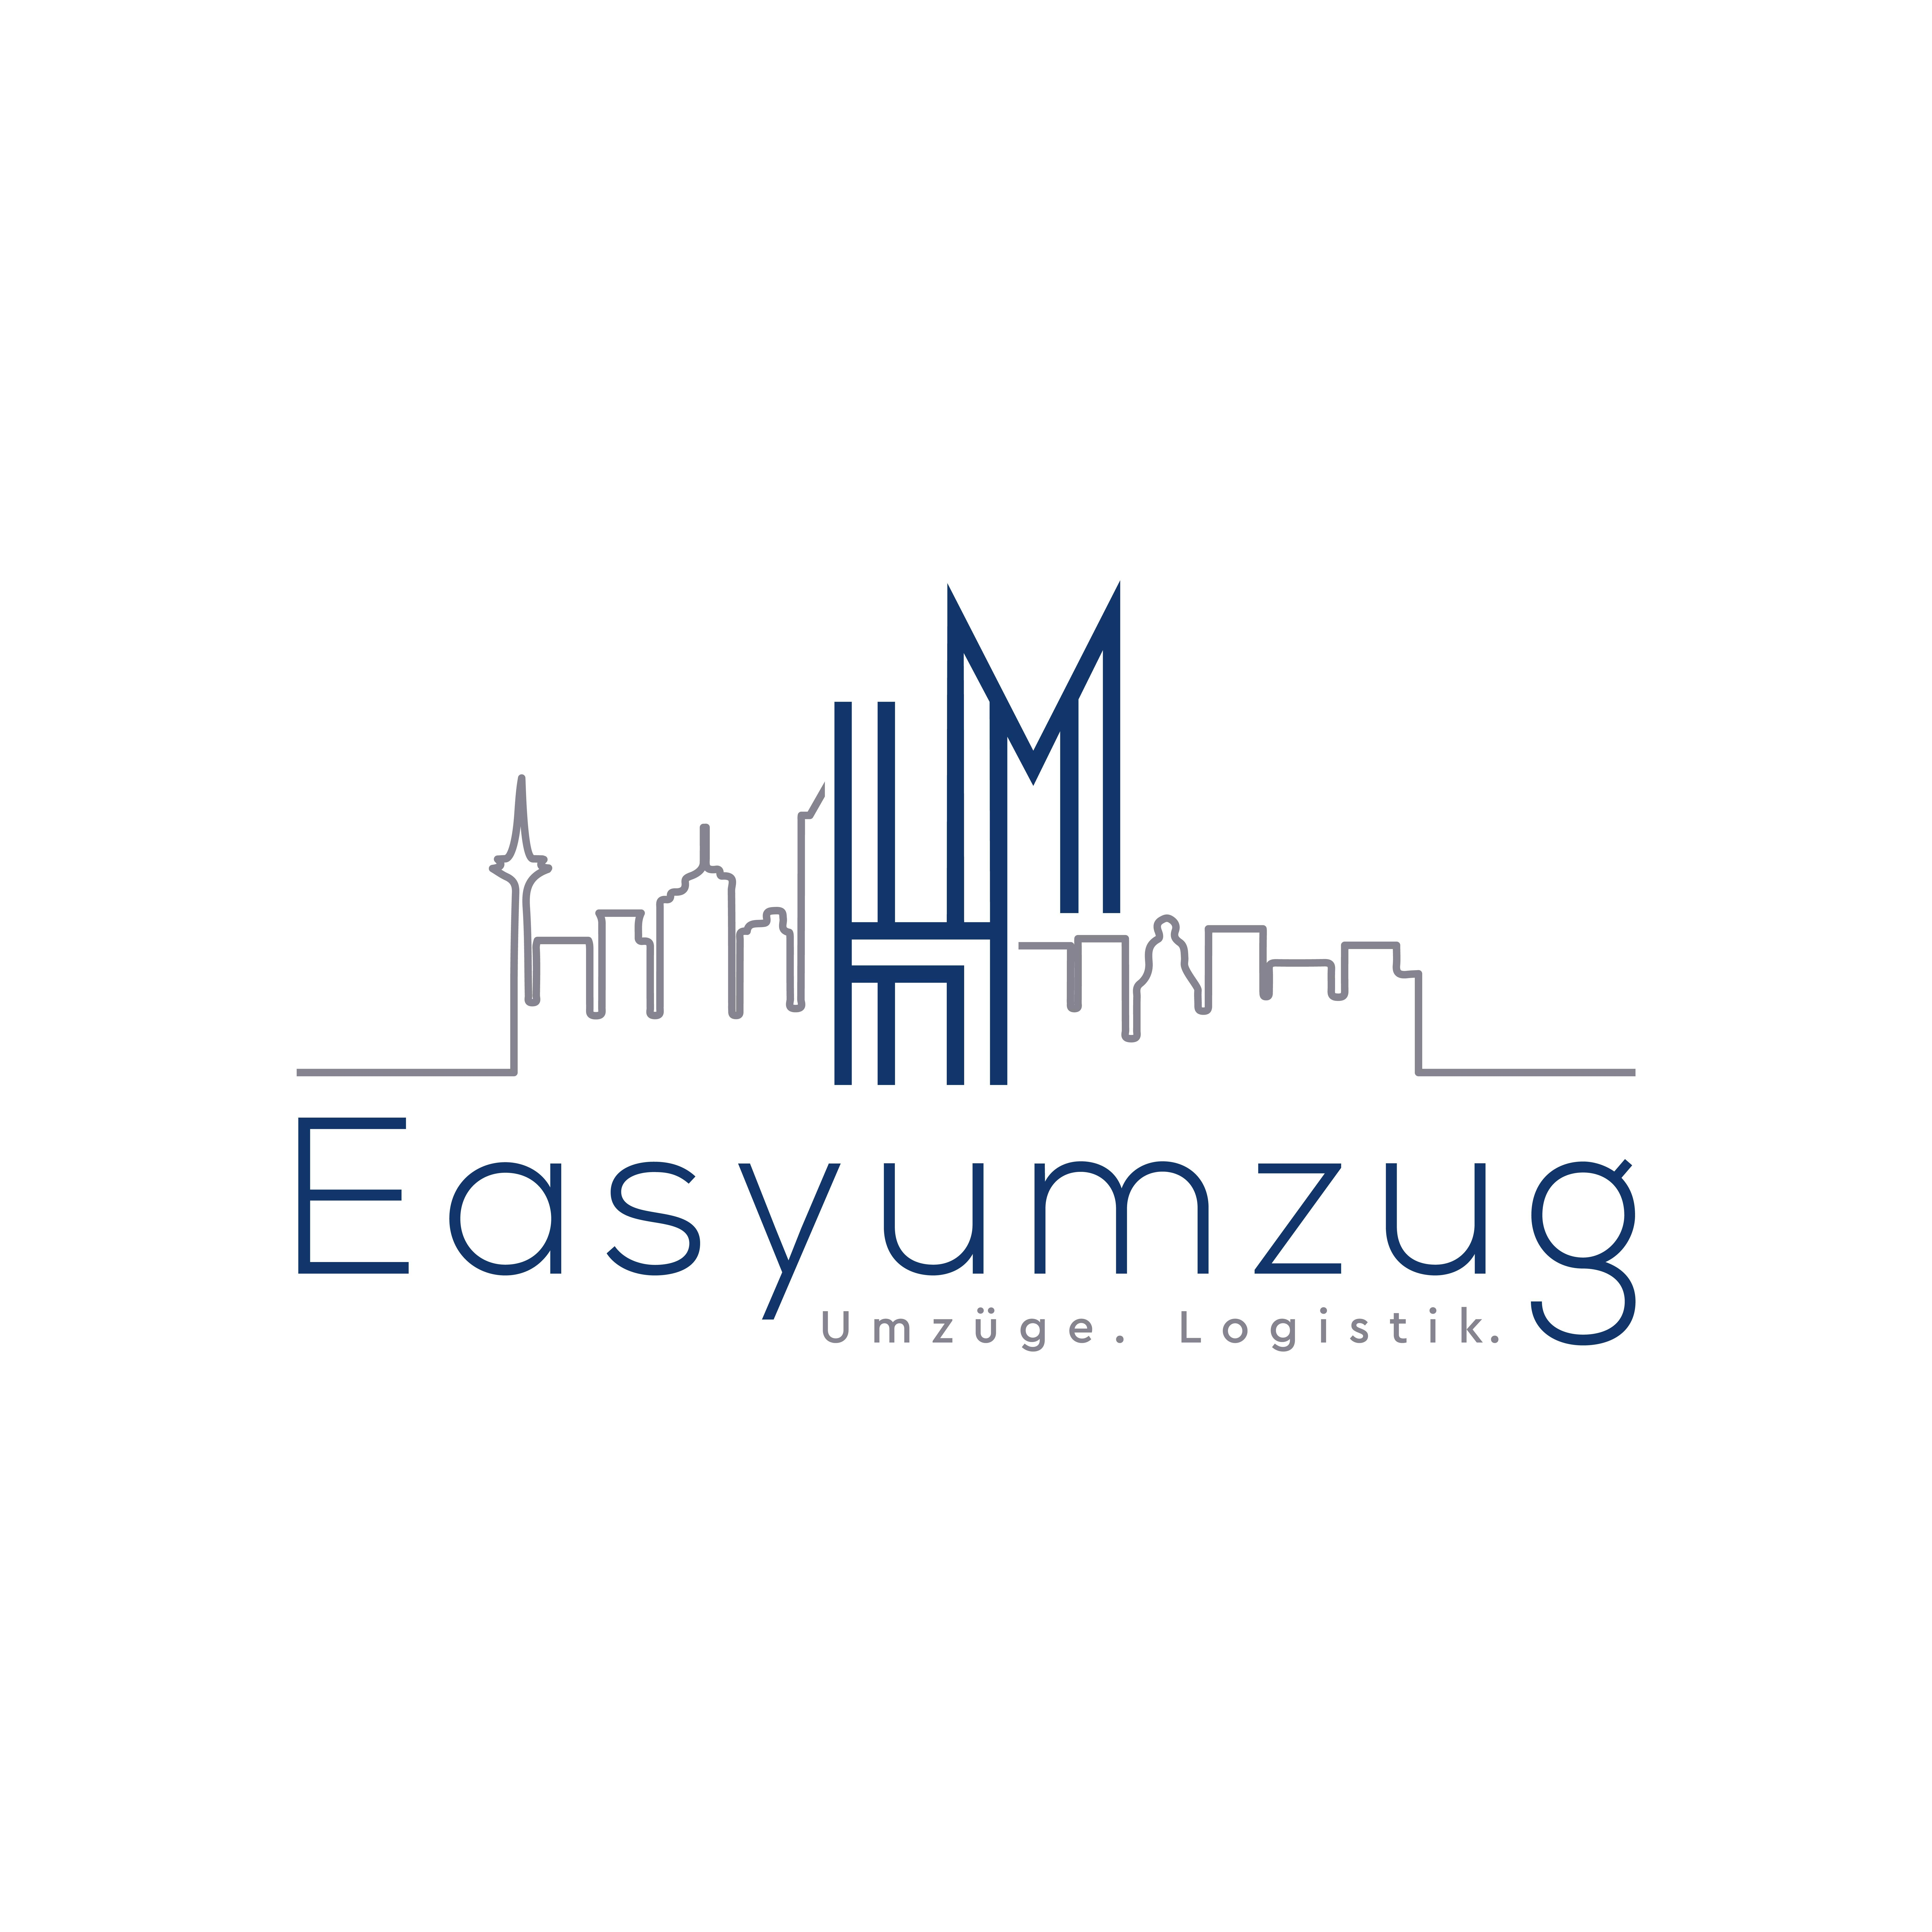 hm-easyumzug-logo